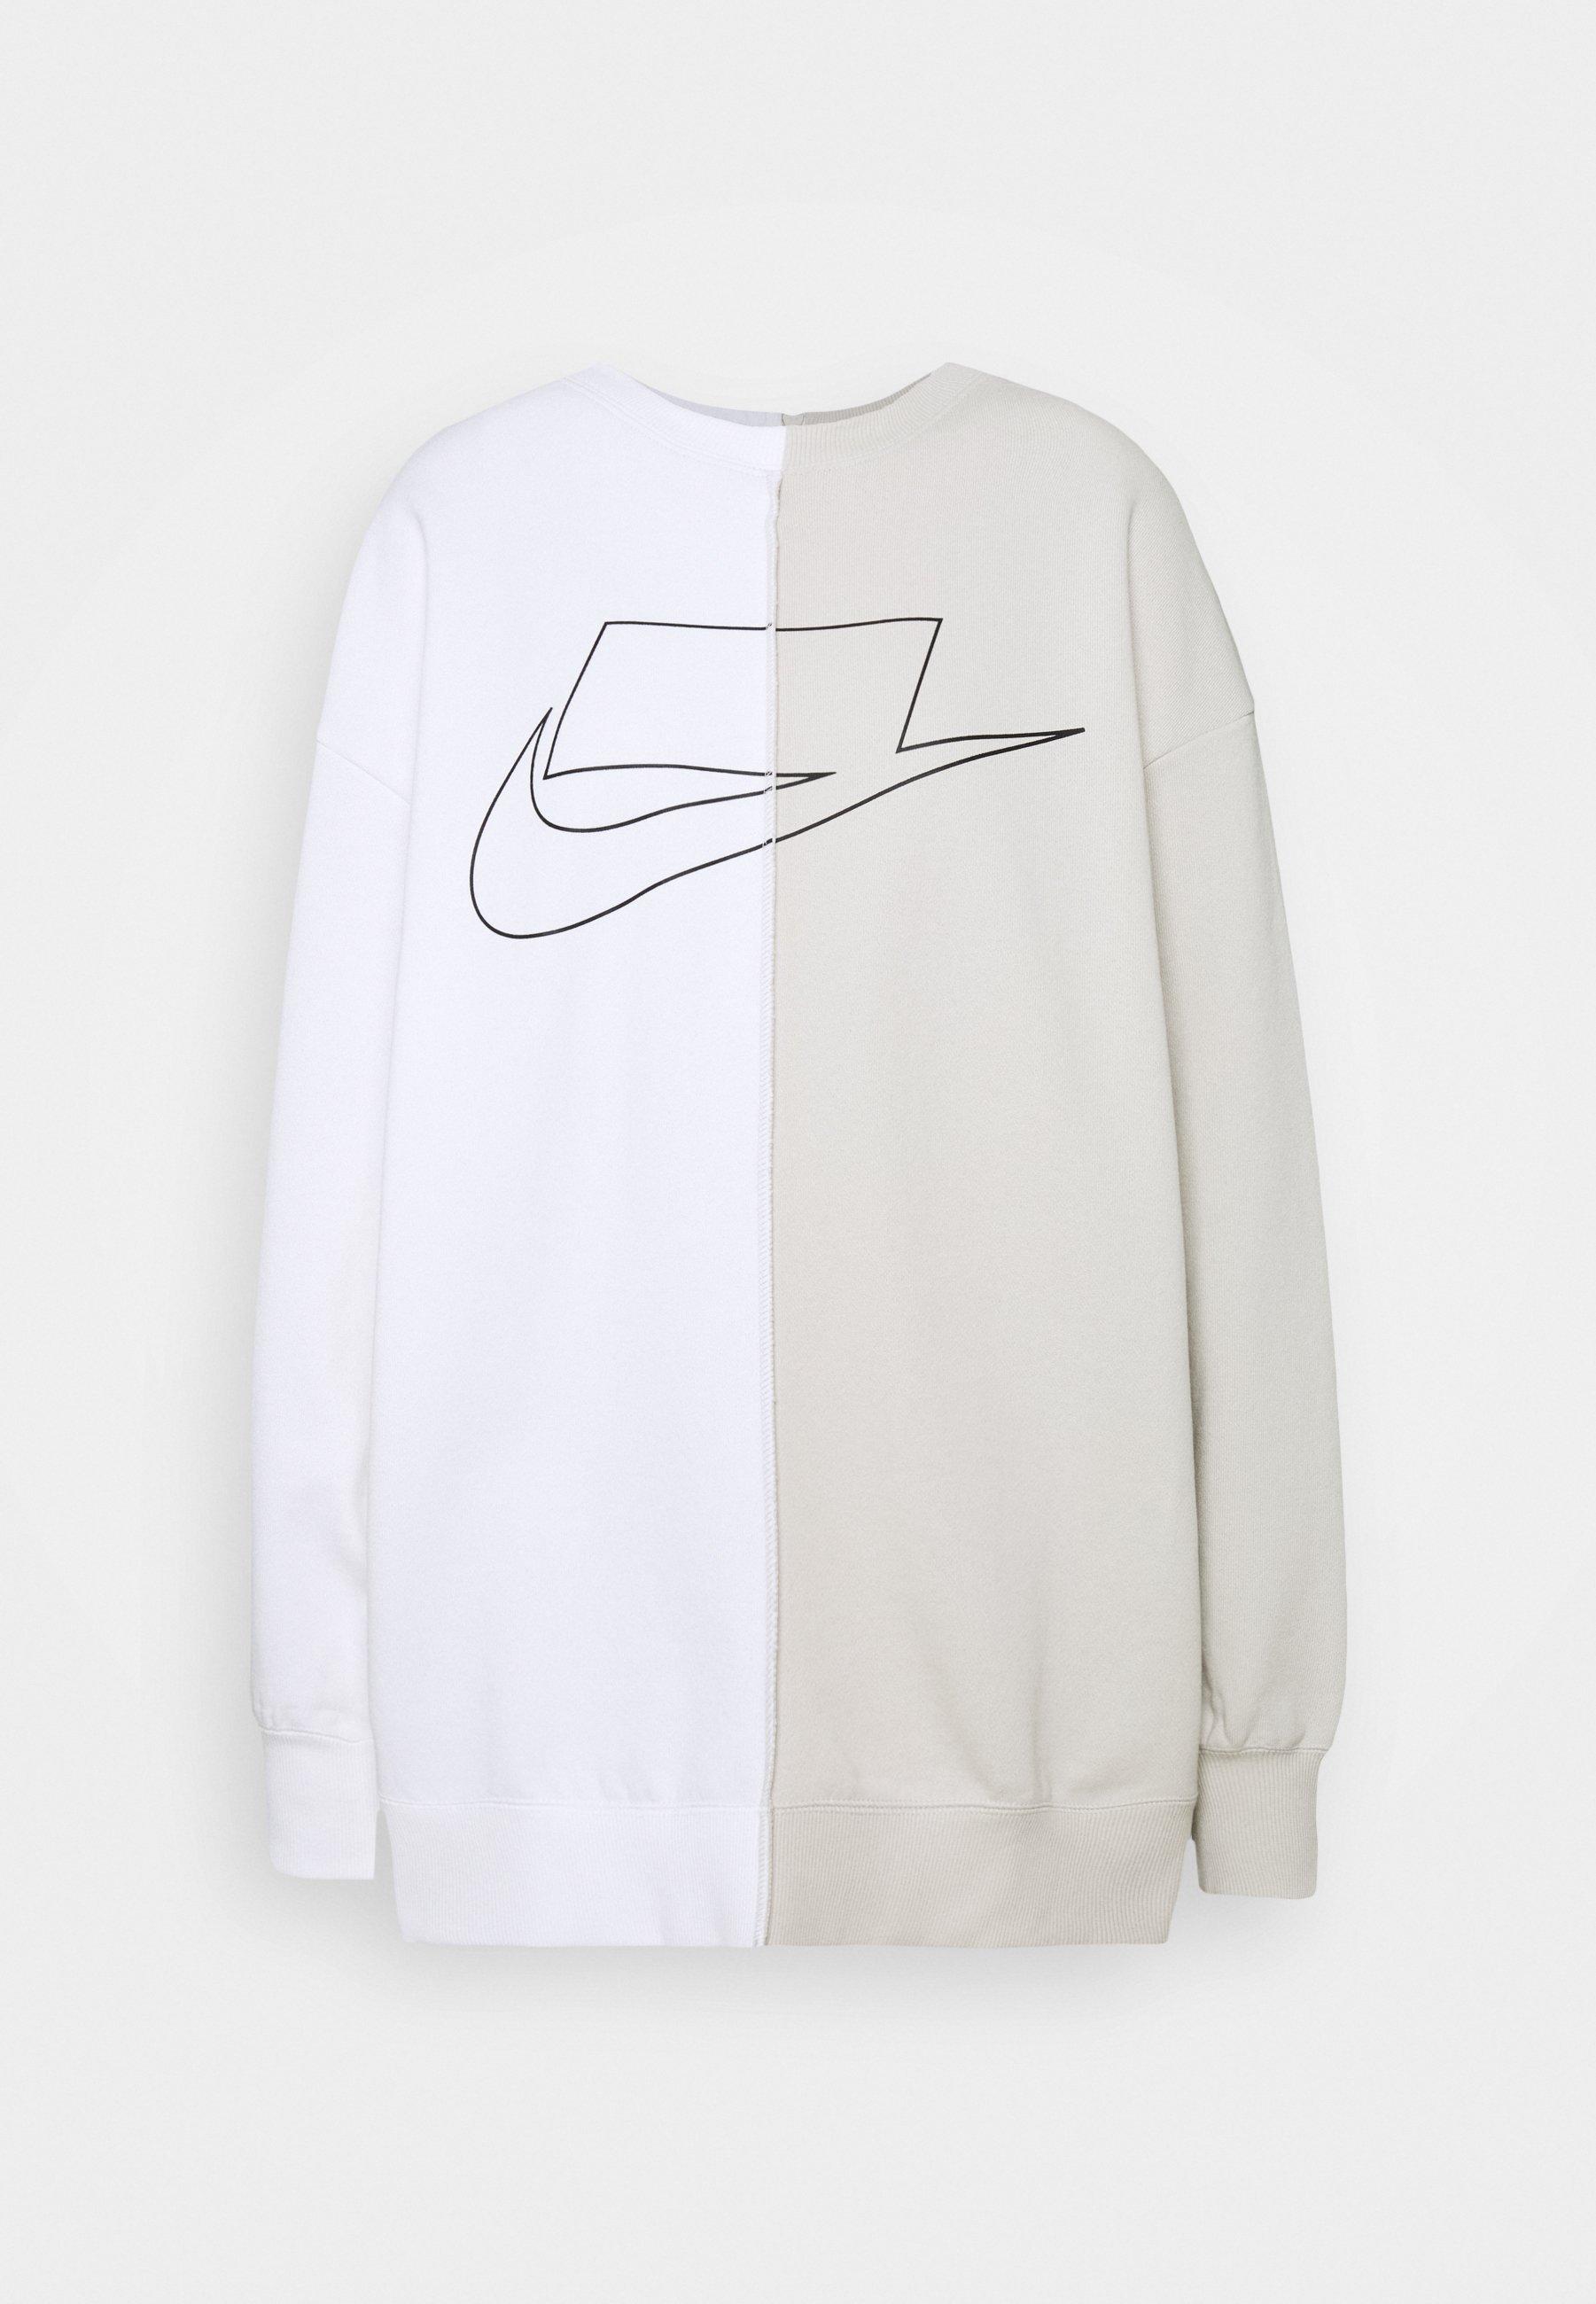 CREW veste en sweat zippée light bonewhiteblack